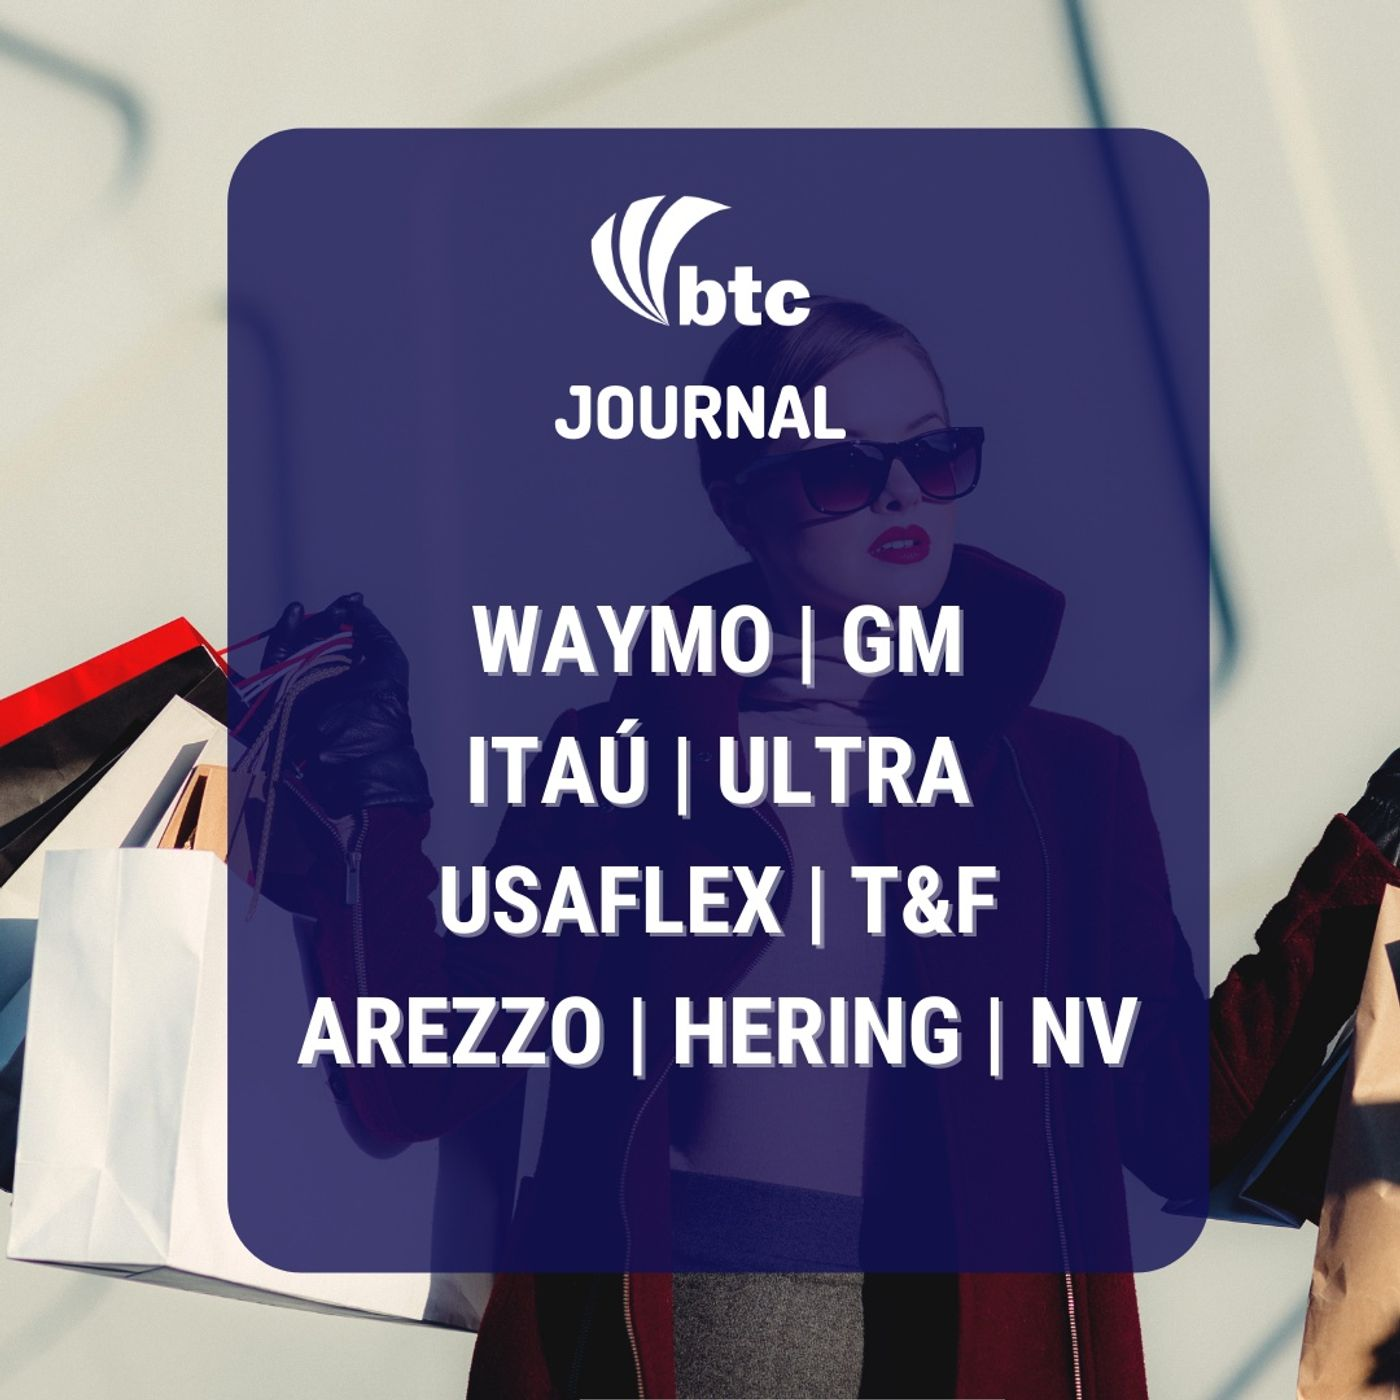 Netflix, Itaú, Grupo Ultra, Arezzo, Grupo Soma, Usaflex, Waymo e GM   BTC Journal 17/06/21